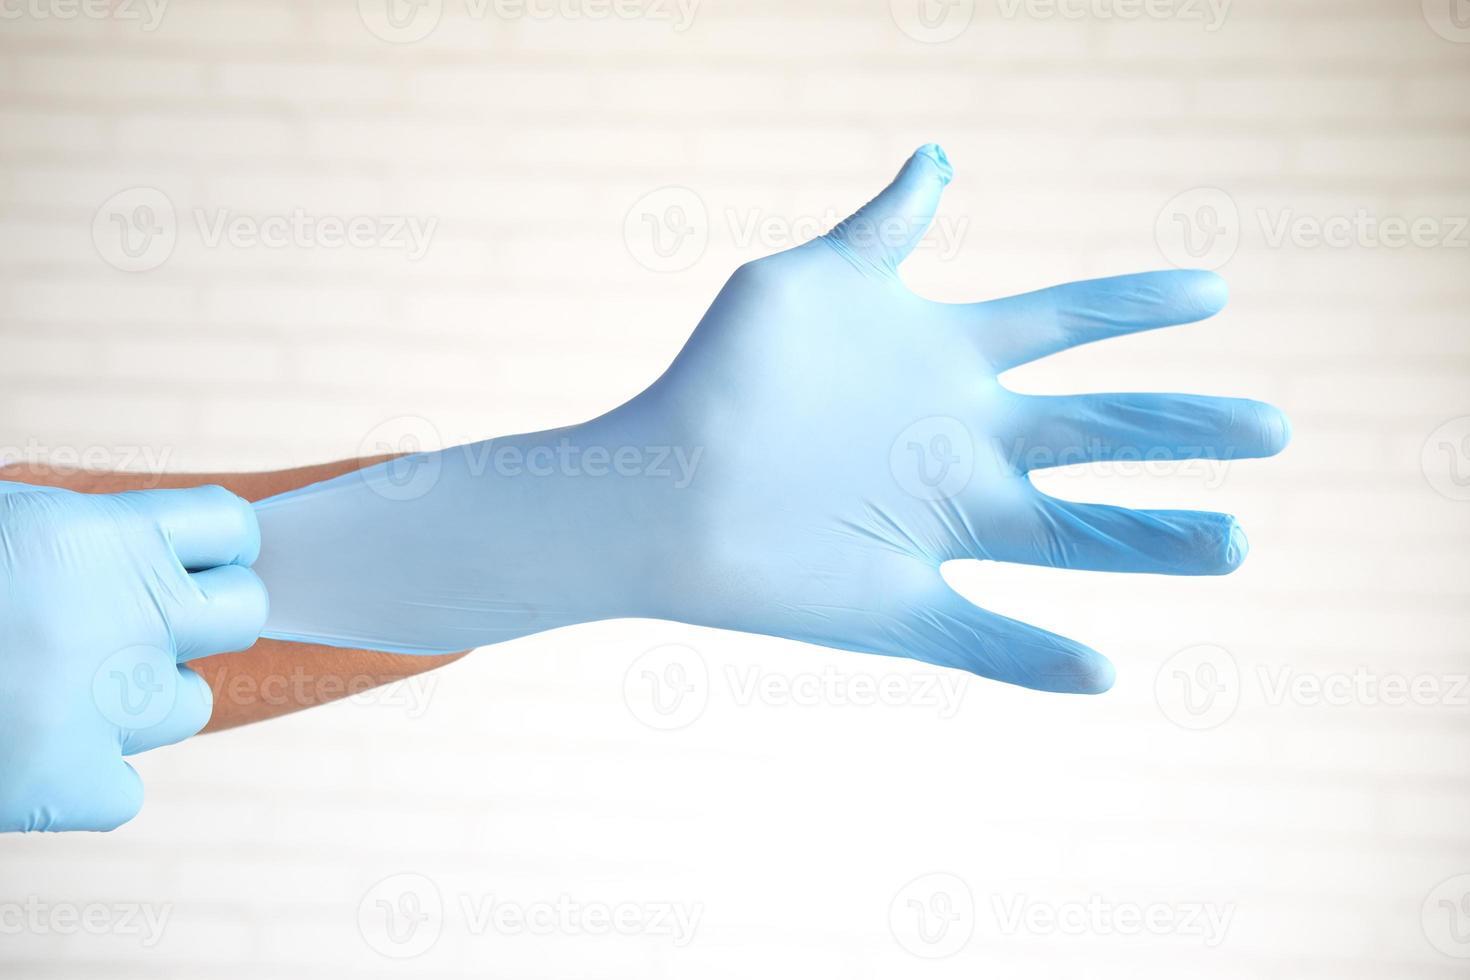 Arzt trägt medizinische Handschuhe, Nahaufnahme foto